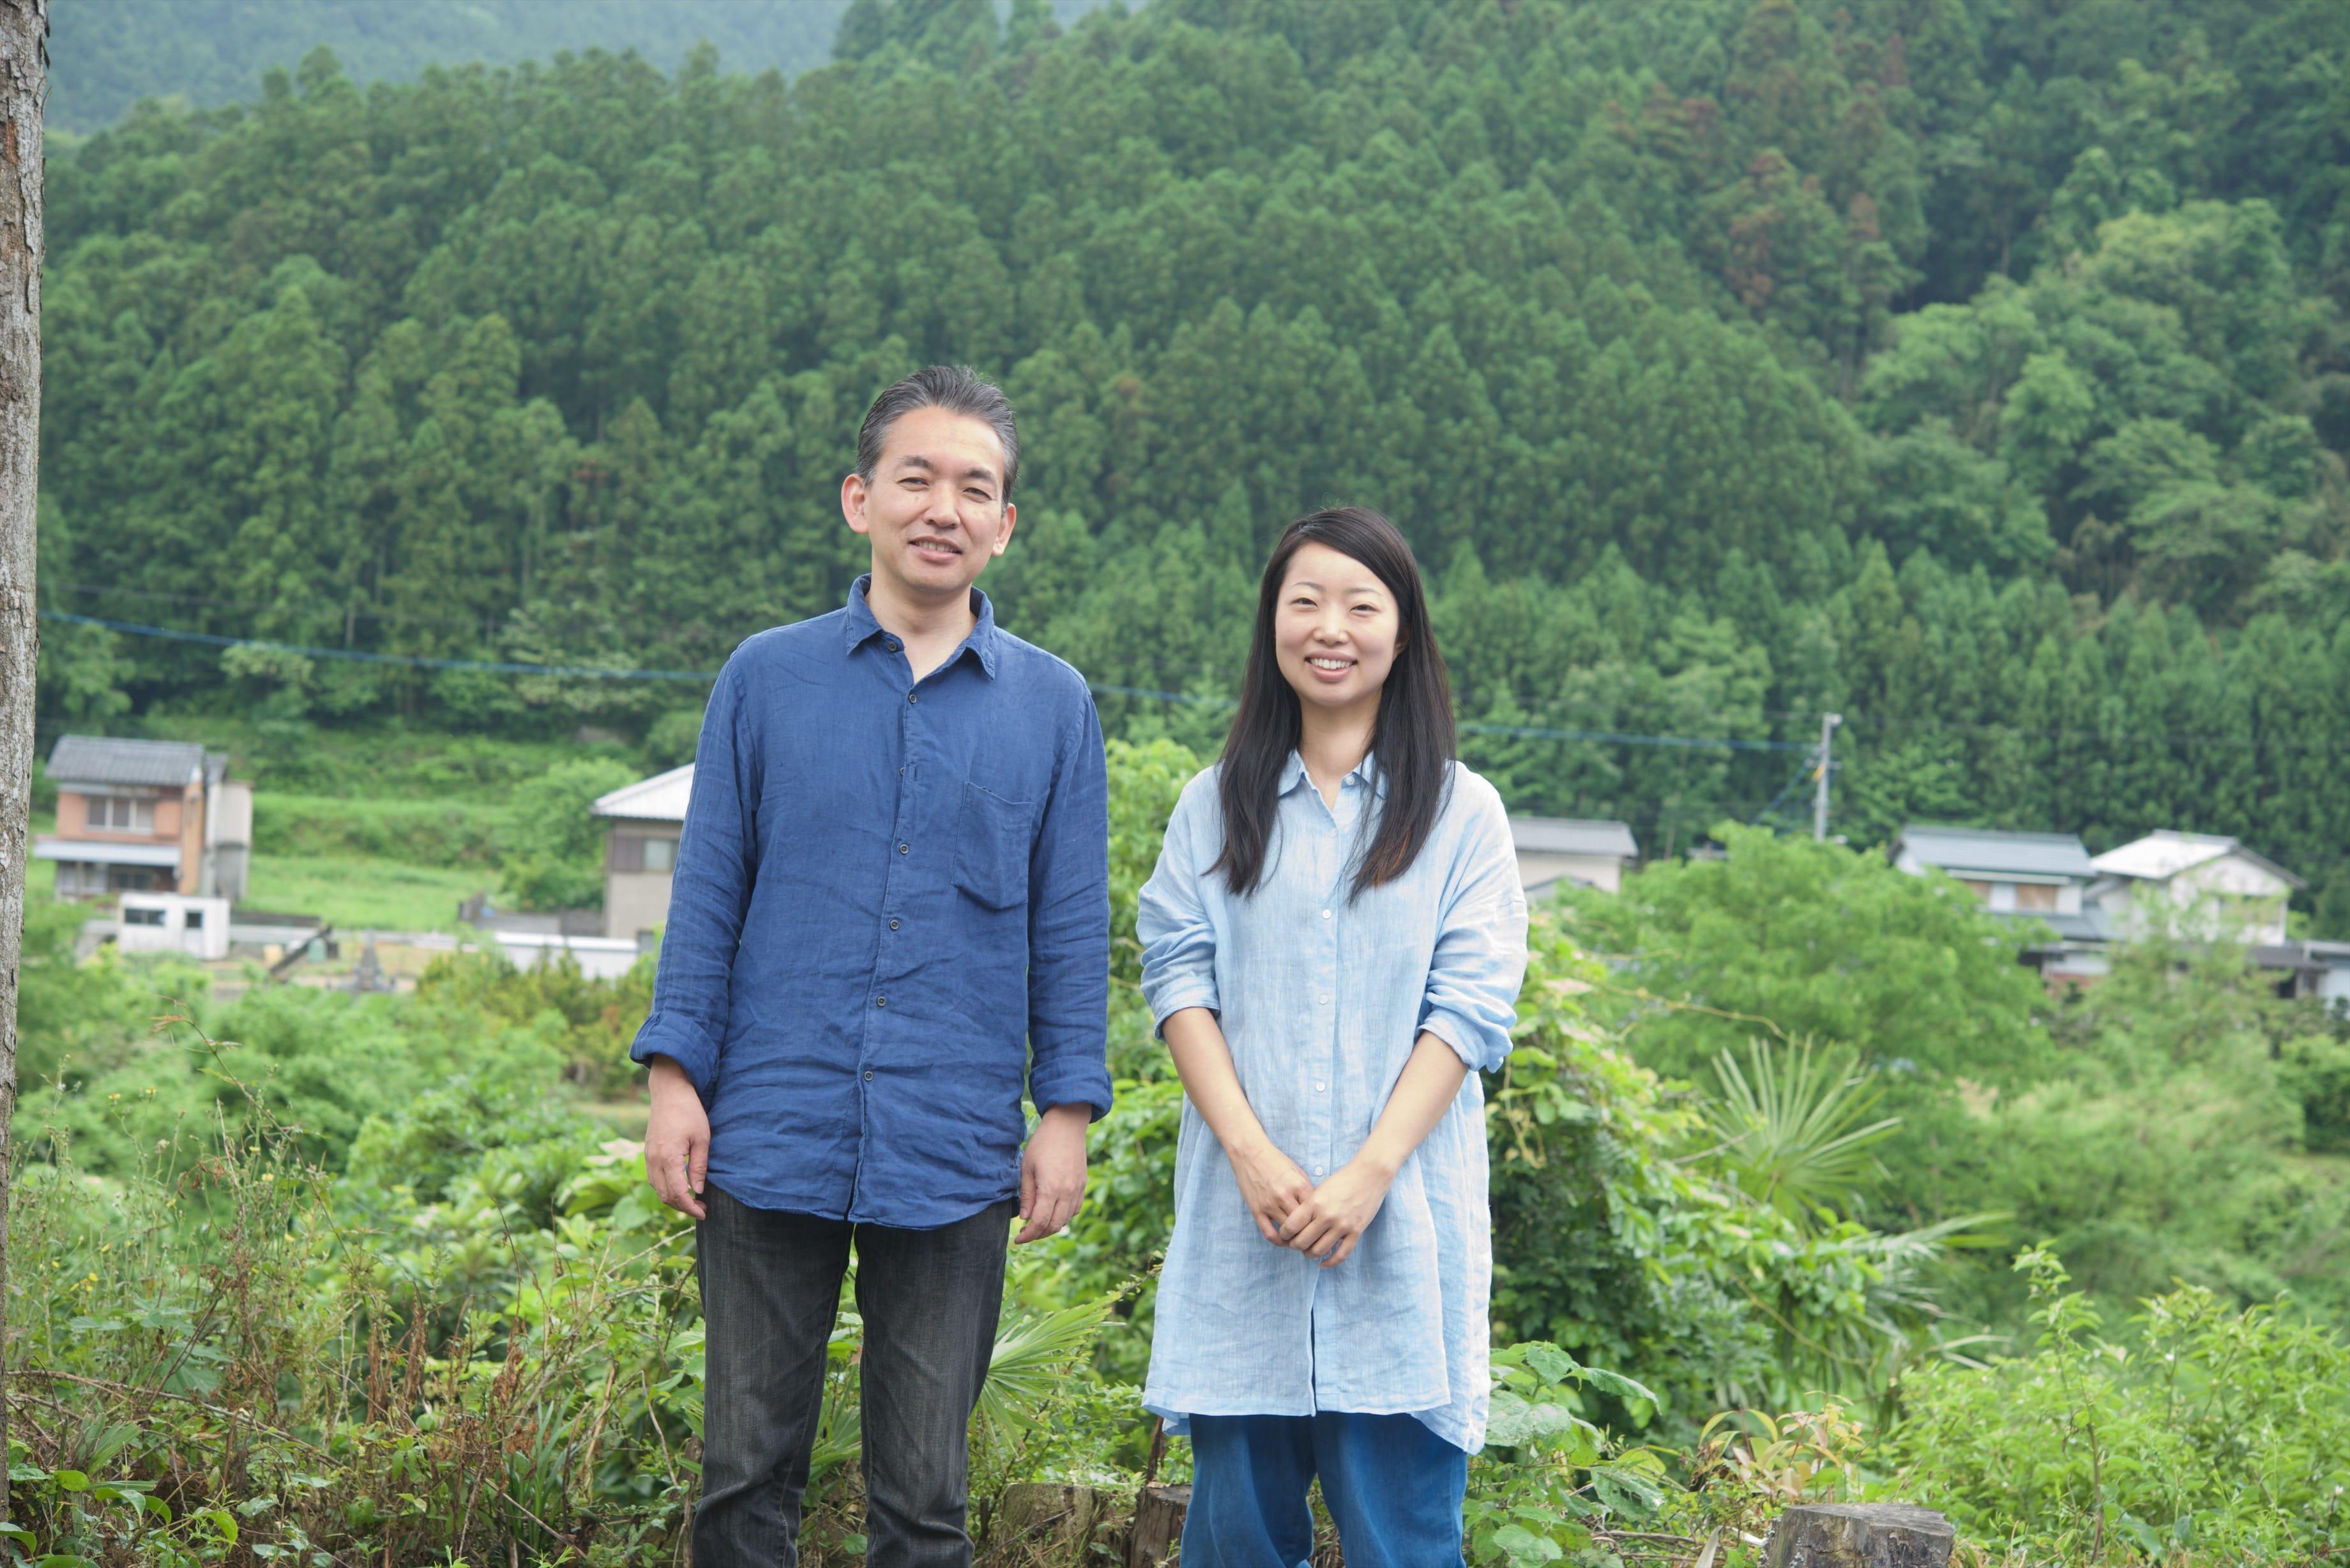 「WEEK 神山」の裏には山々が広がっている。オーナーの隅田徹さんと。